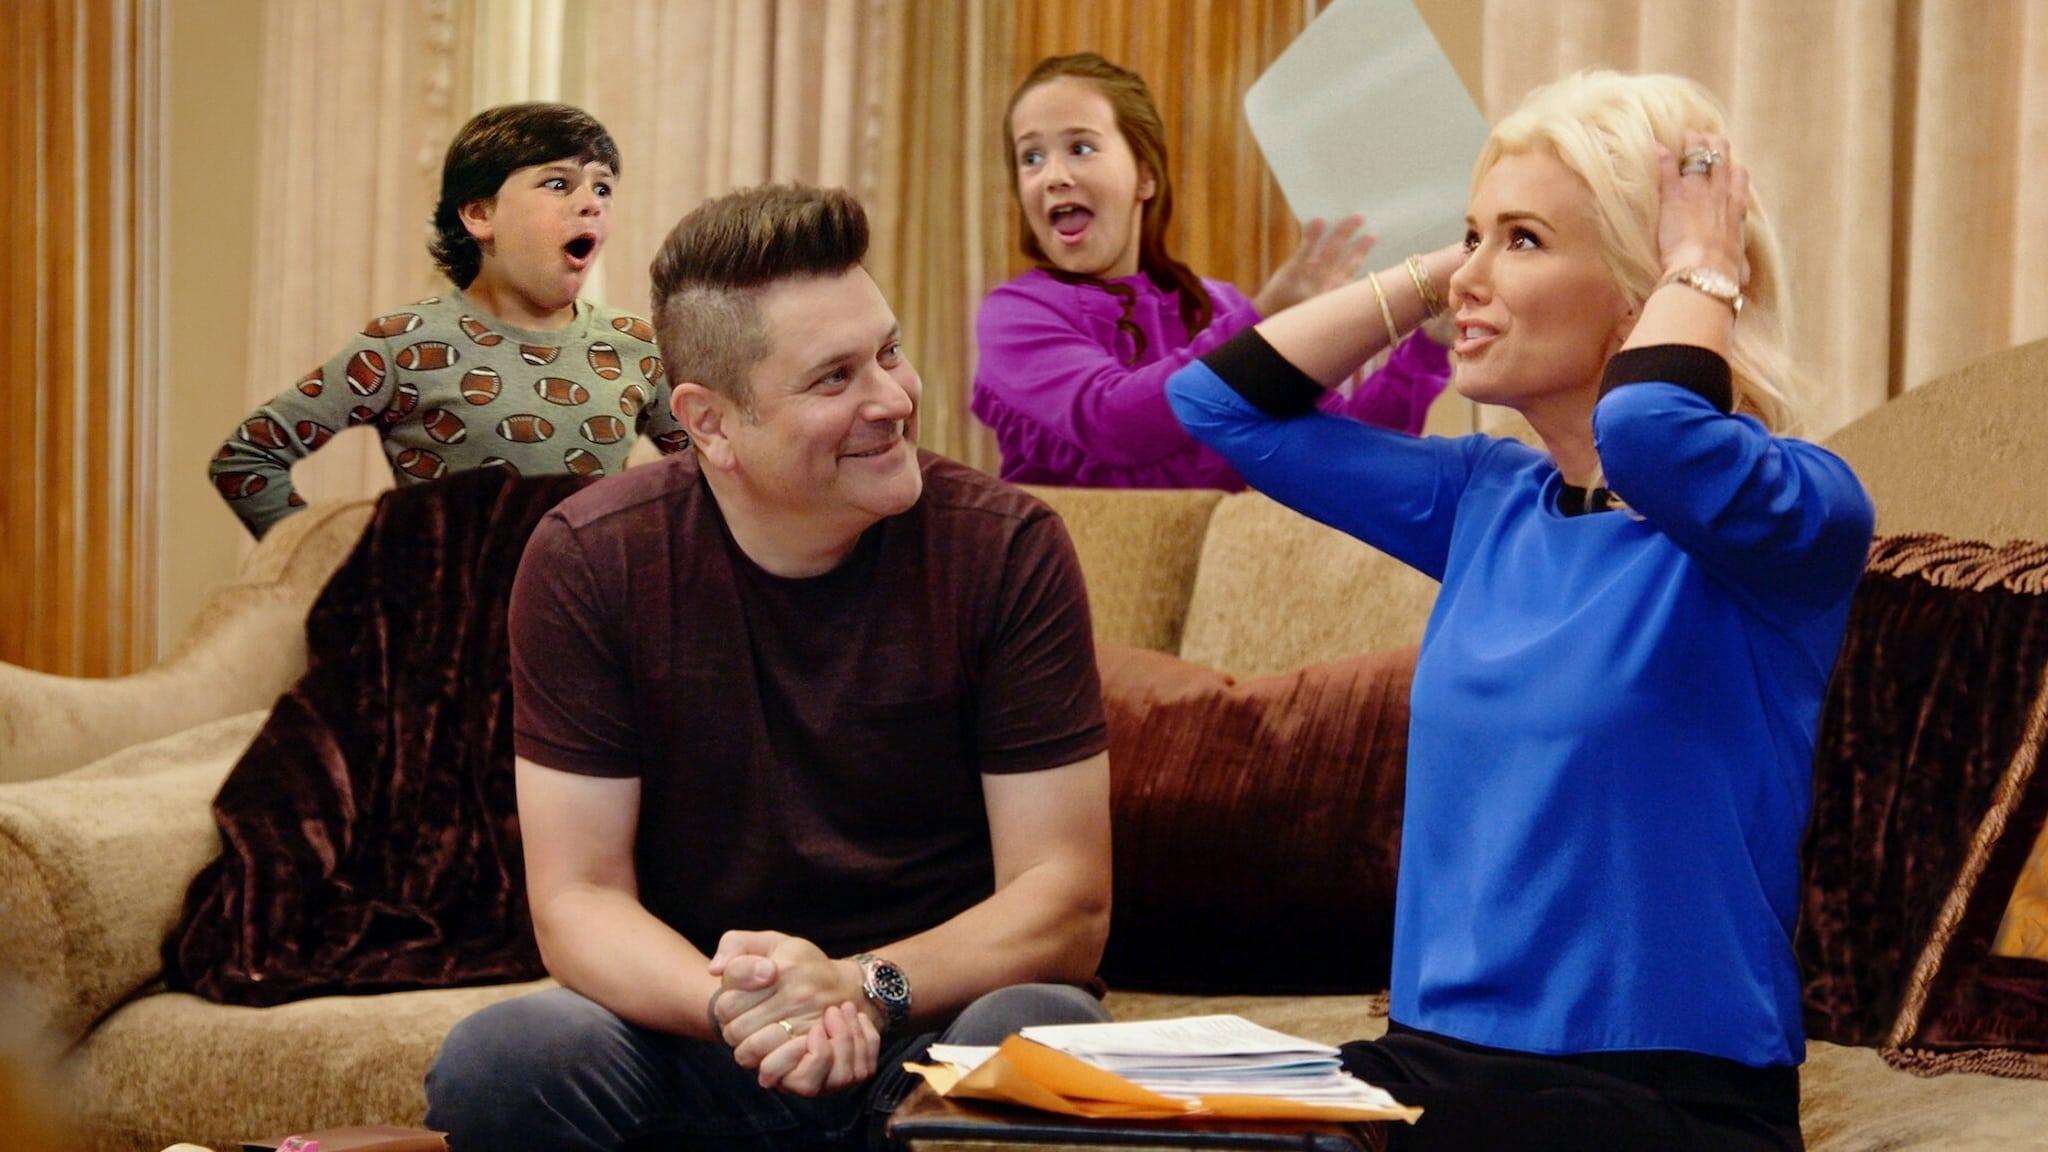 720p~ DeMarcus Family Rules Season 1 Episode 1